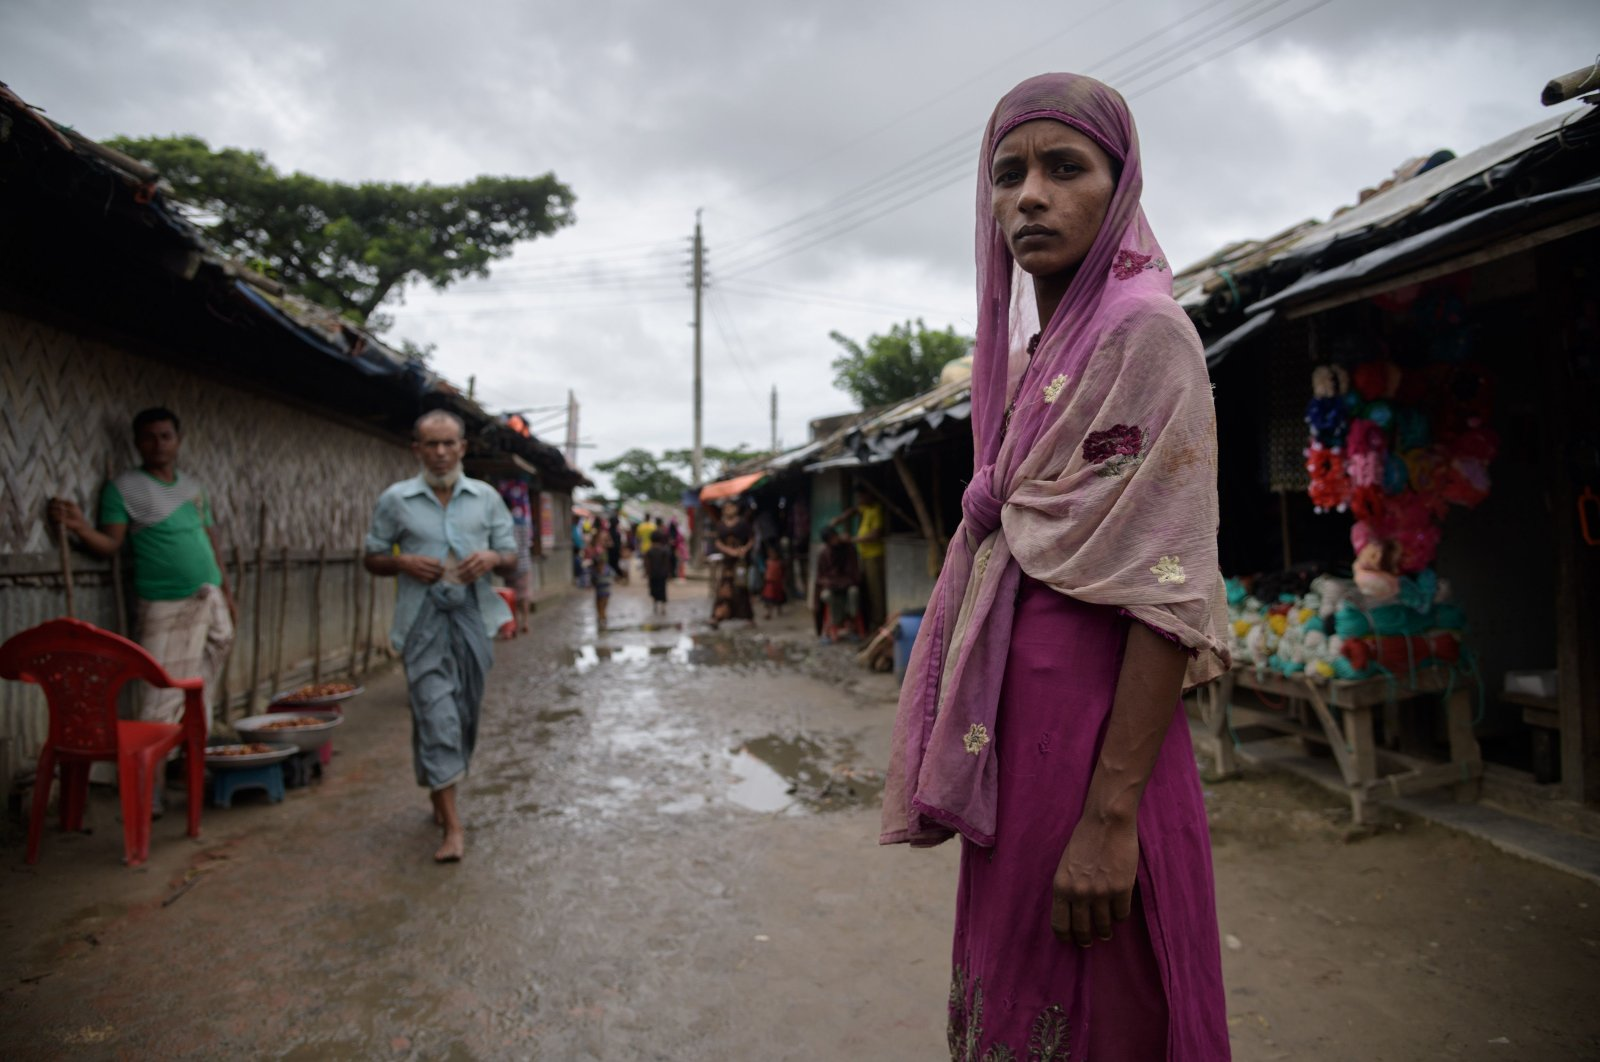 A Rohingya refugee stands on a path in the Nayapara refugee camp near Cox's Bazar, Bangladesh, Aug. 13, 2018. (AFP Photo)